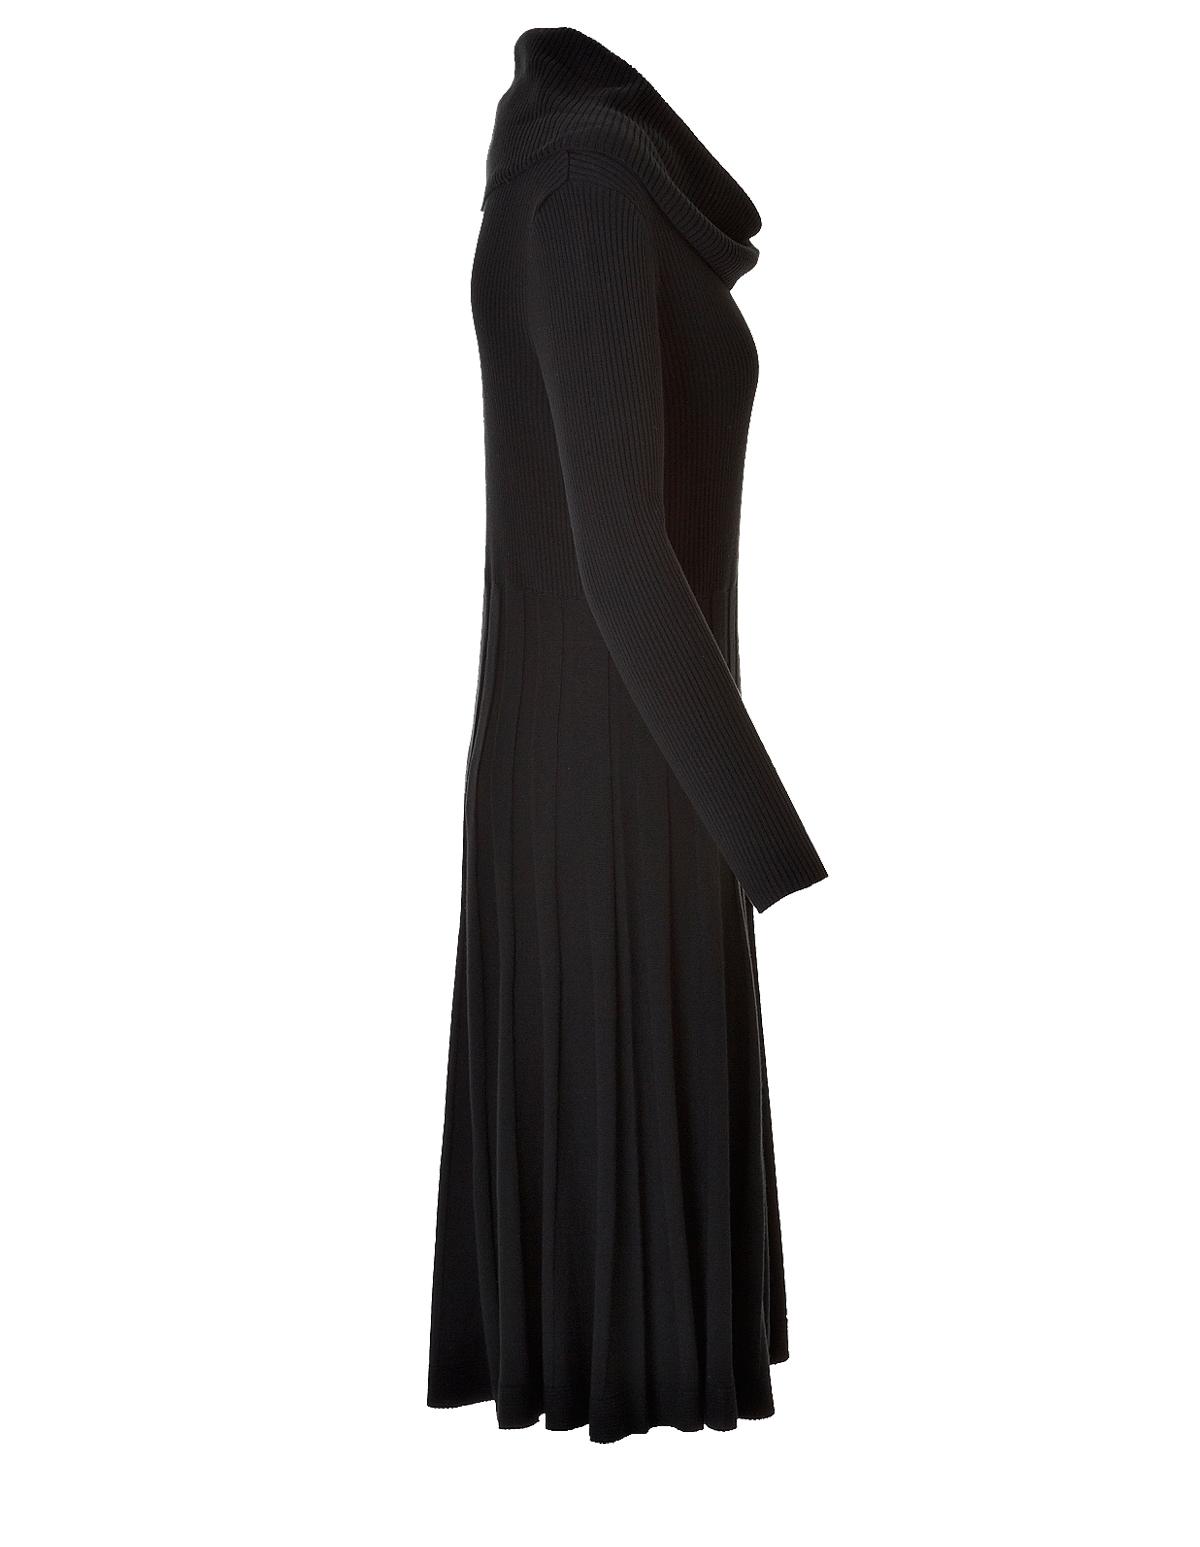 Black Cowl Neck Sweater Dress Cleo